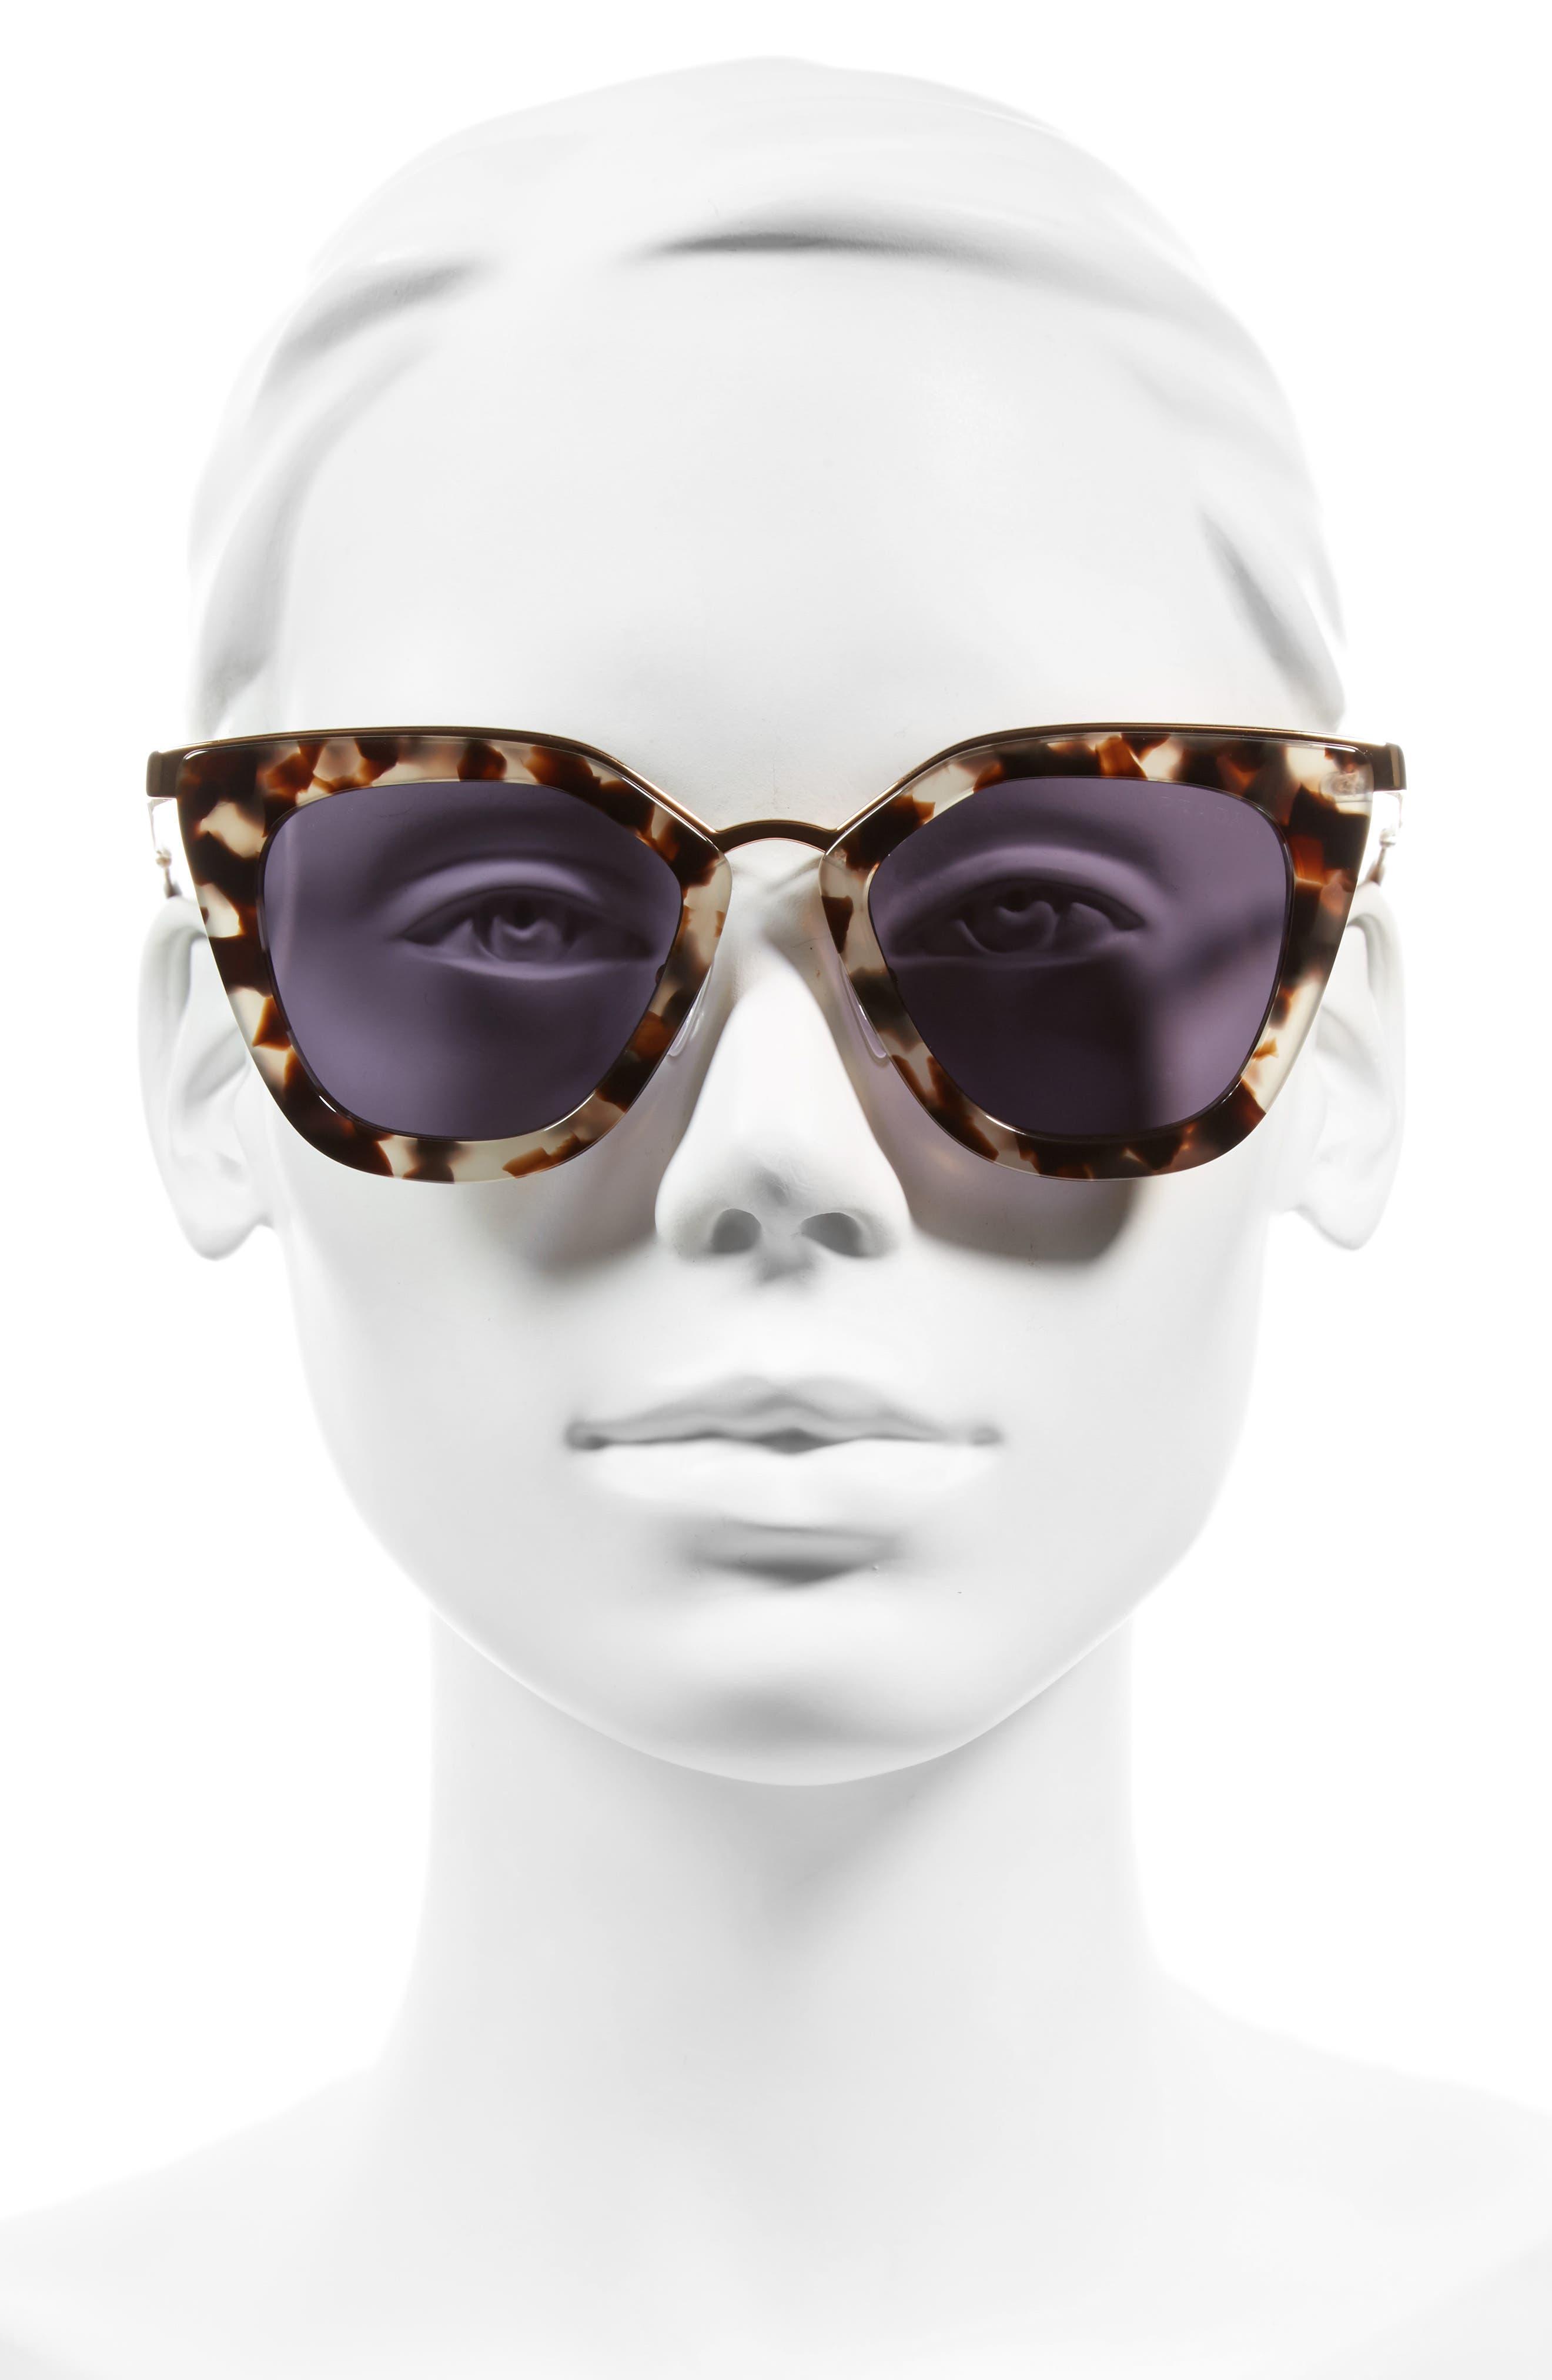 52mm Layered Frame Sunglasses,                             Alternate thumbnail 3, color,